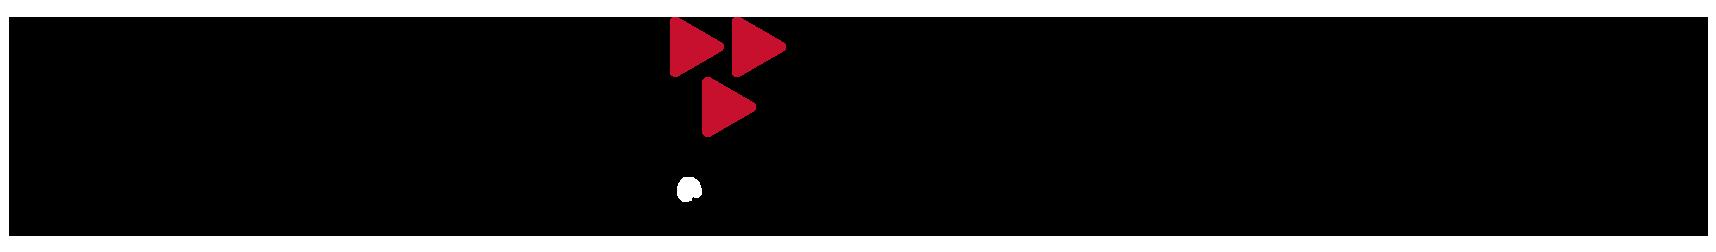 Skillsoft Compliance Solutions